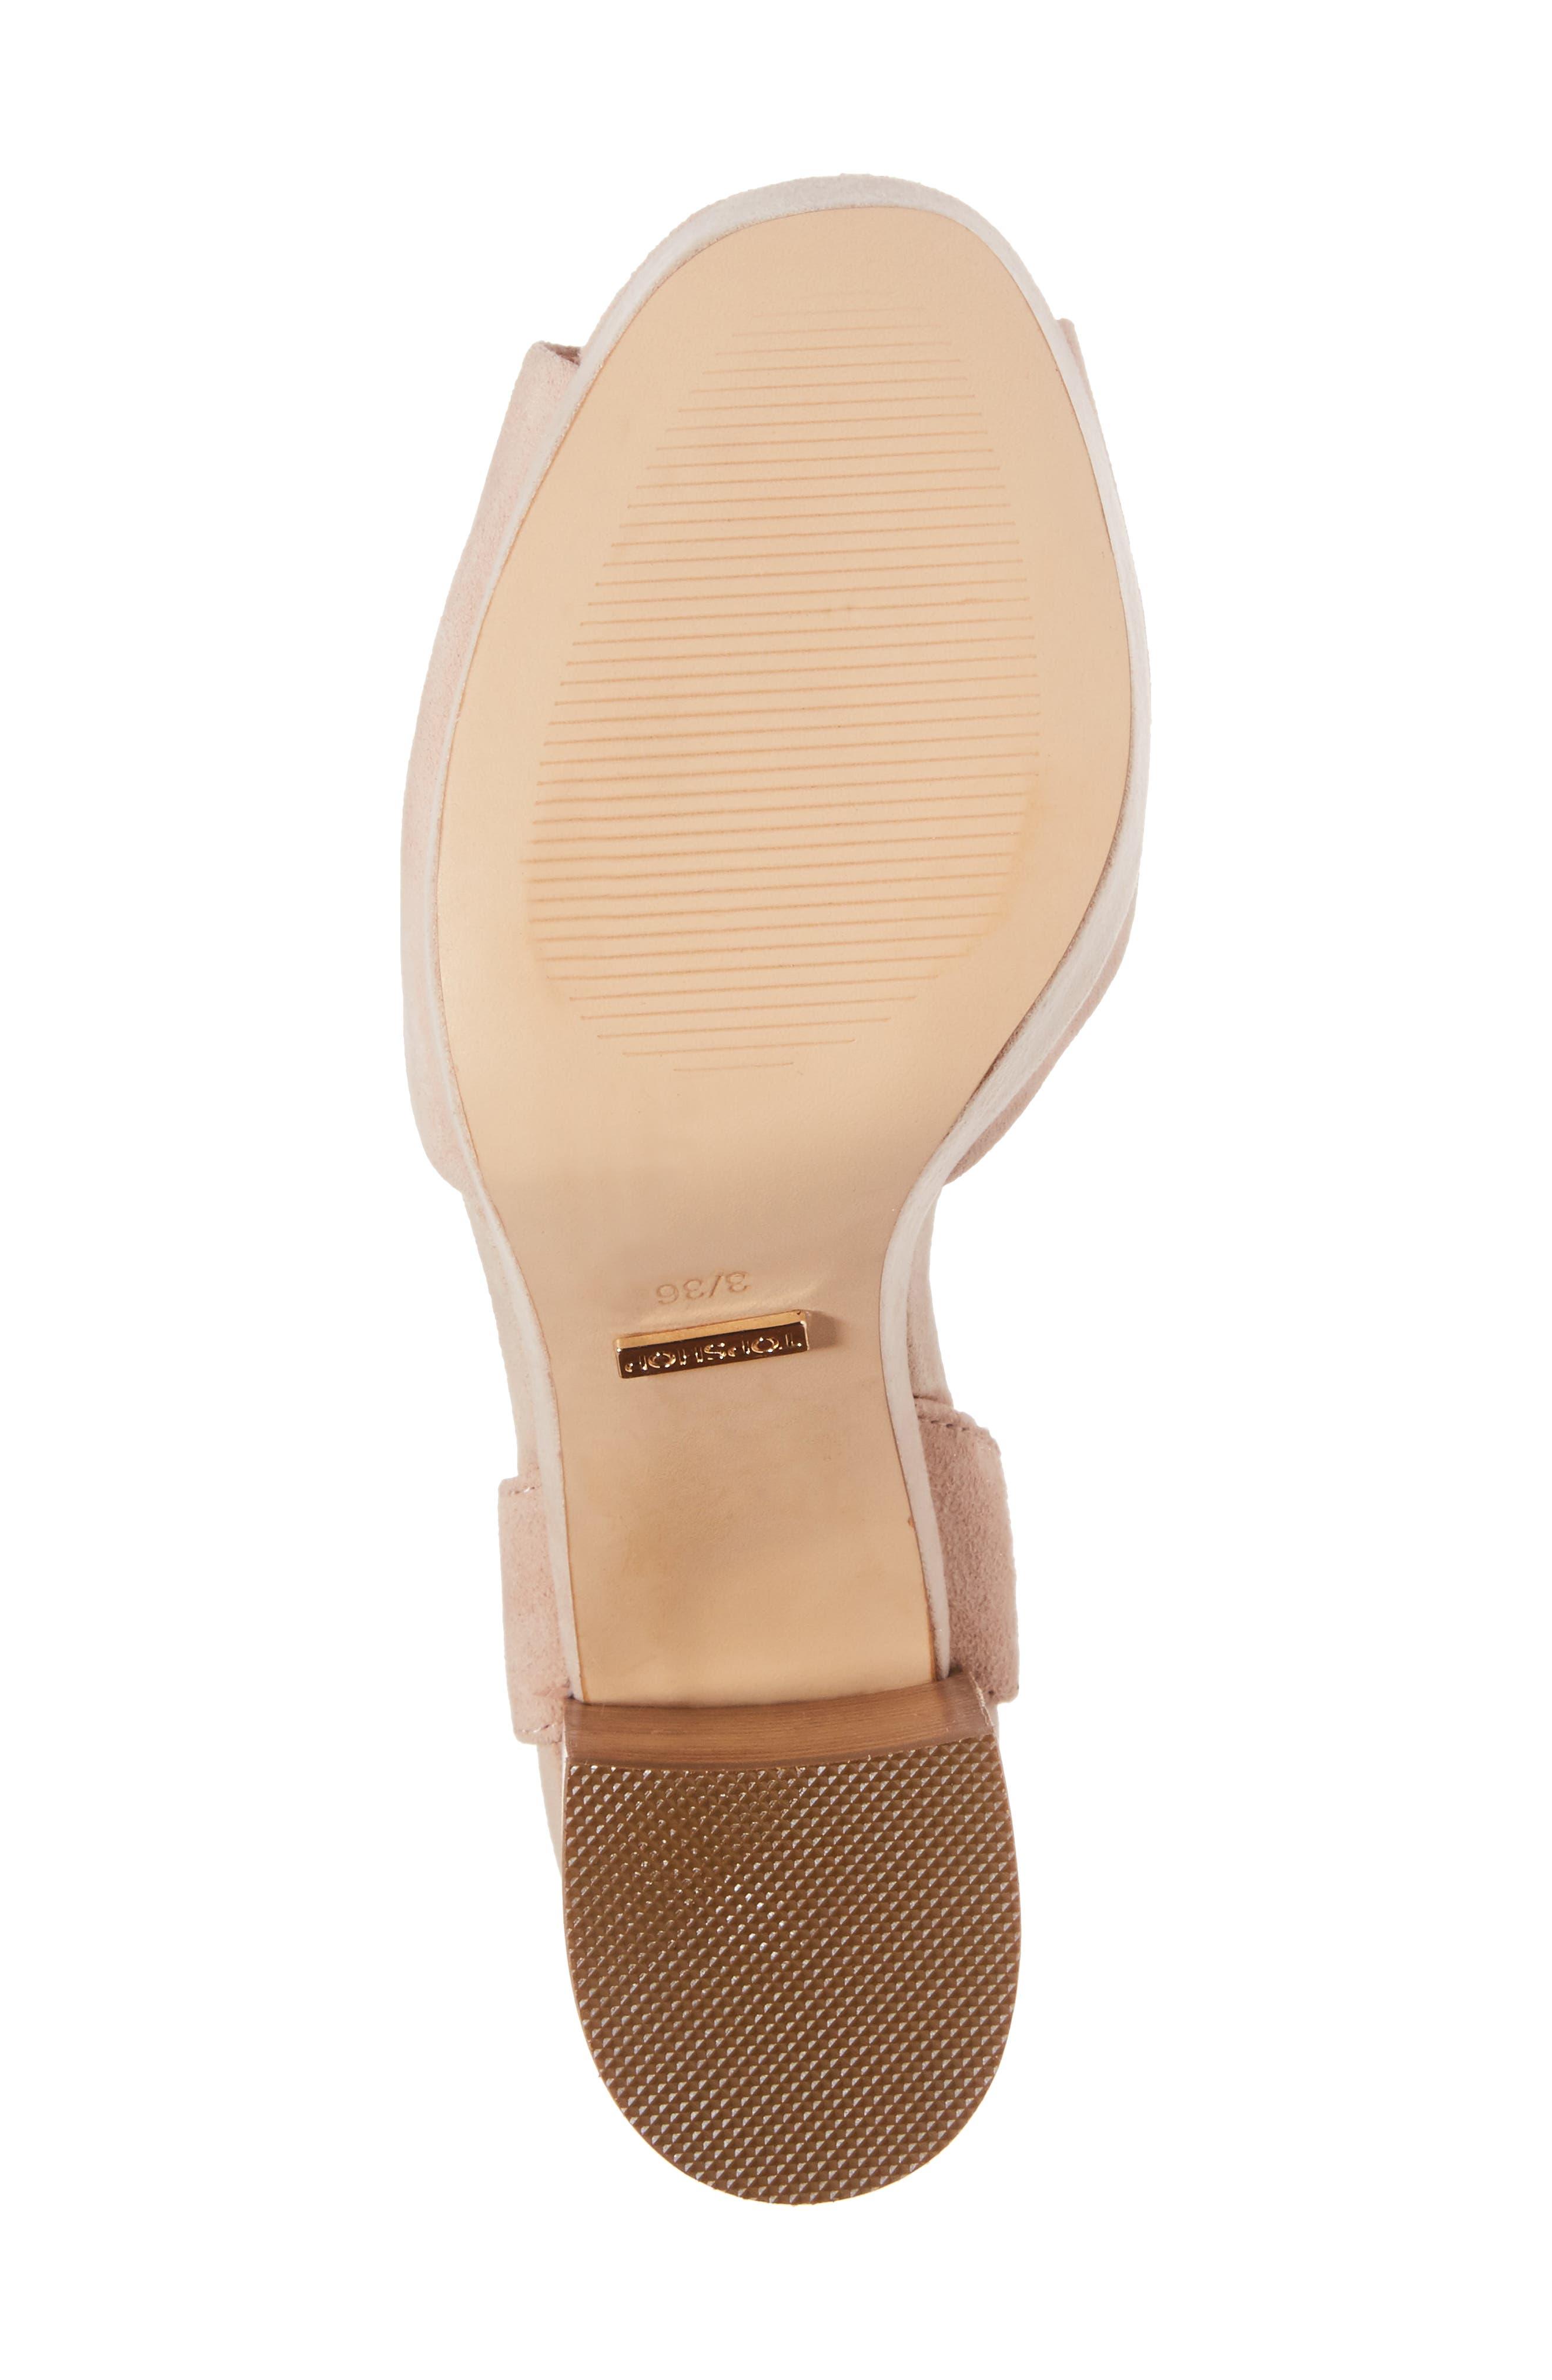 'Lana' Chunky Platform Sandal,                             Alternate thumbnail 6, color,                             250